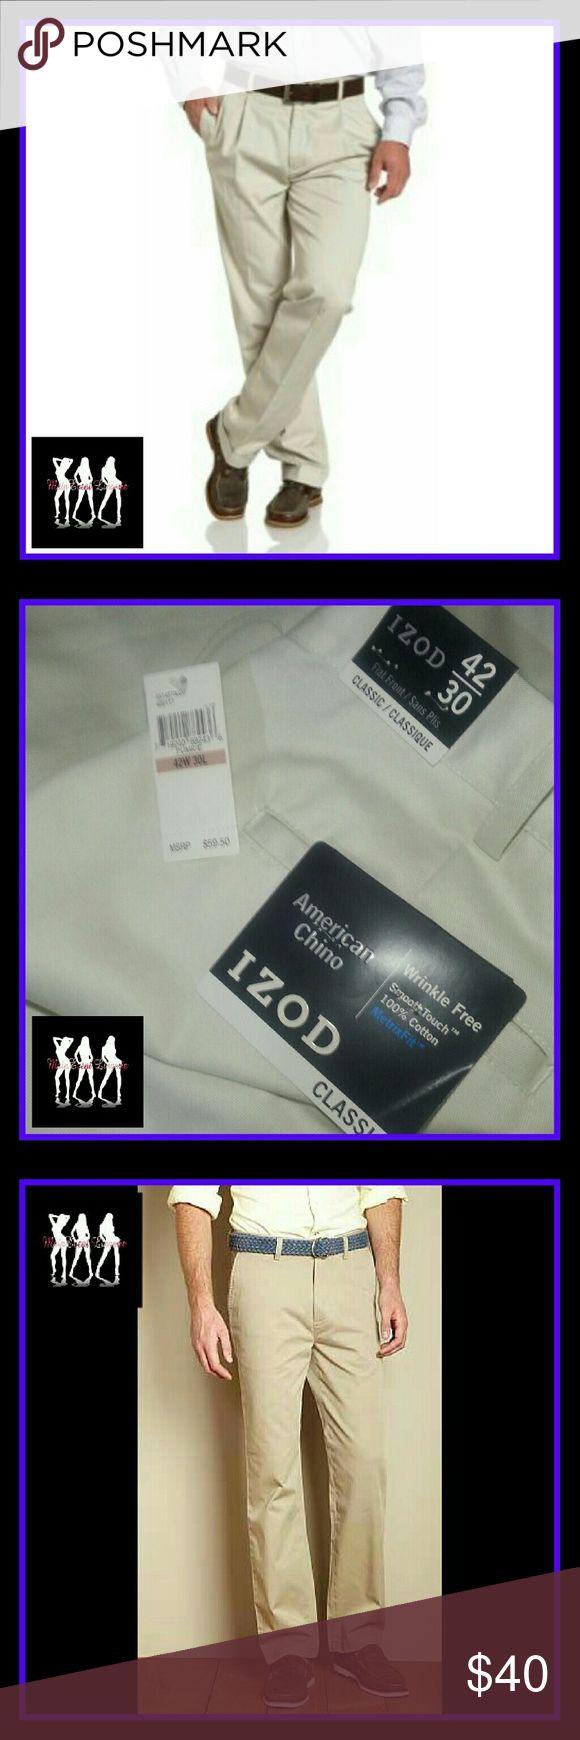 Izod American Chino mens pants (size: 42) Brand New and never worn. Very fashionable & stylish. Izod Pants Chinos & Khakis